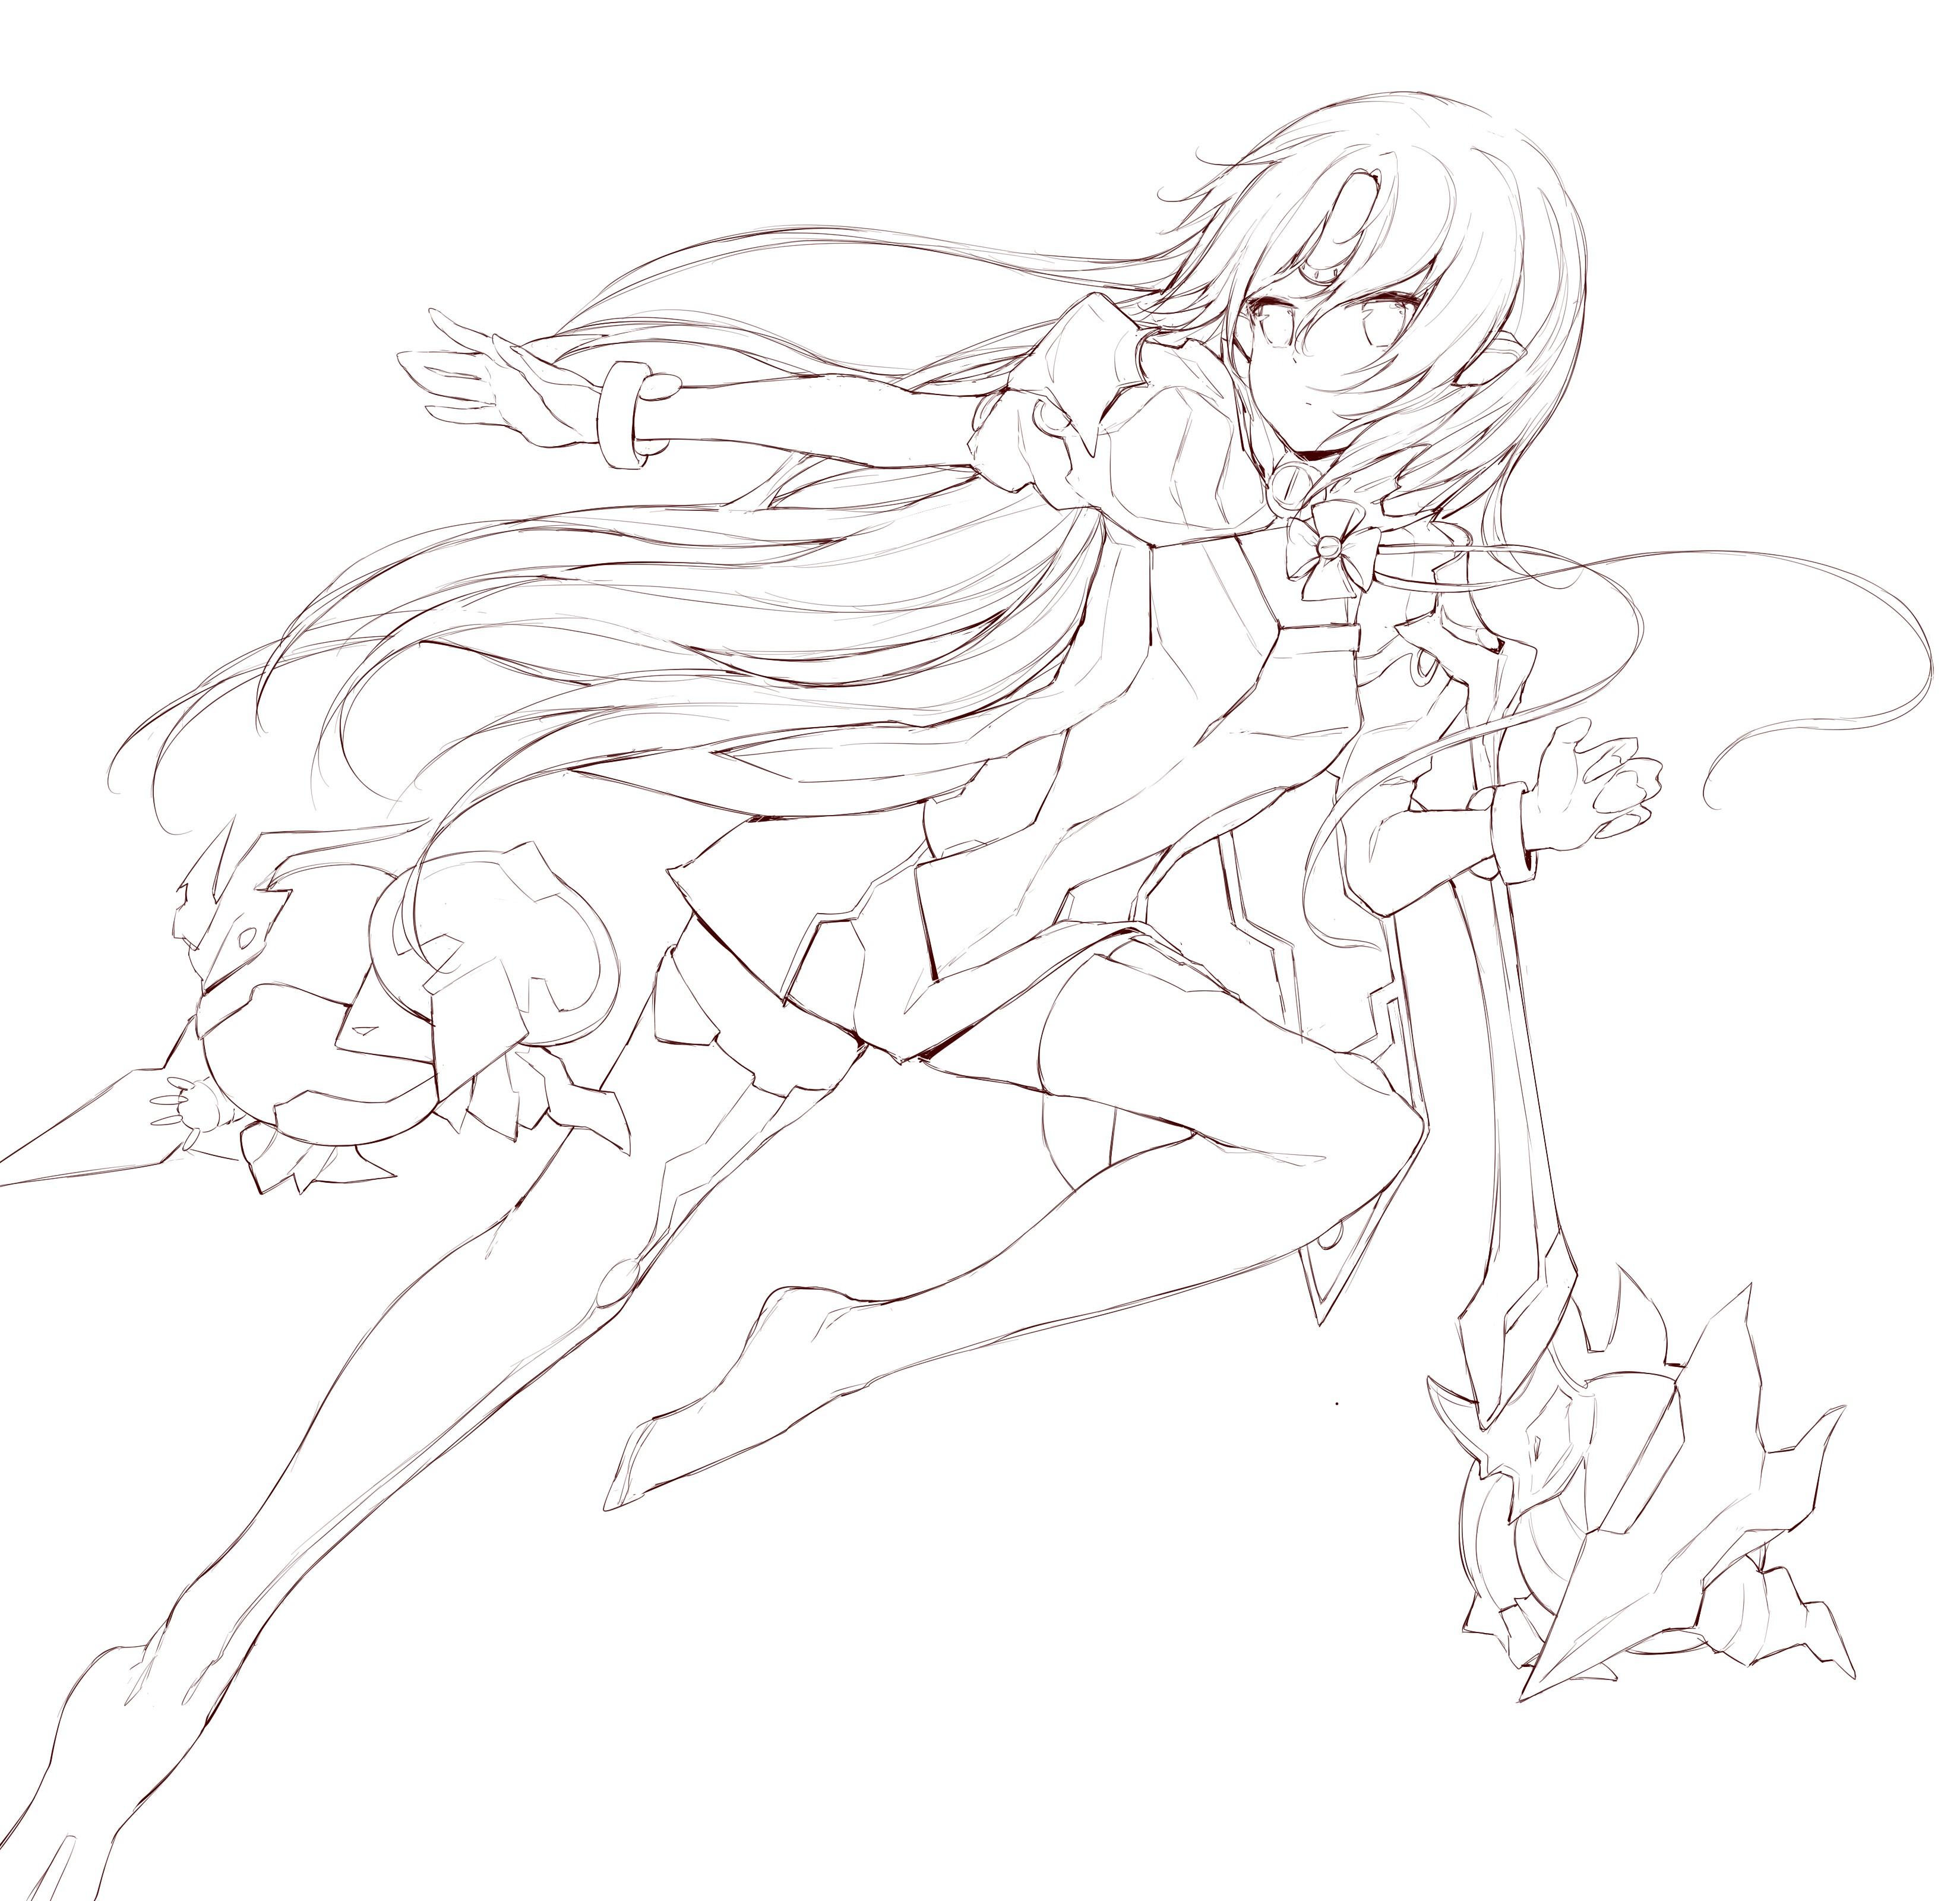 Tapety Ilustrace Digitalni Umeni Anime Divky Umelecka Dila